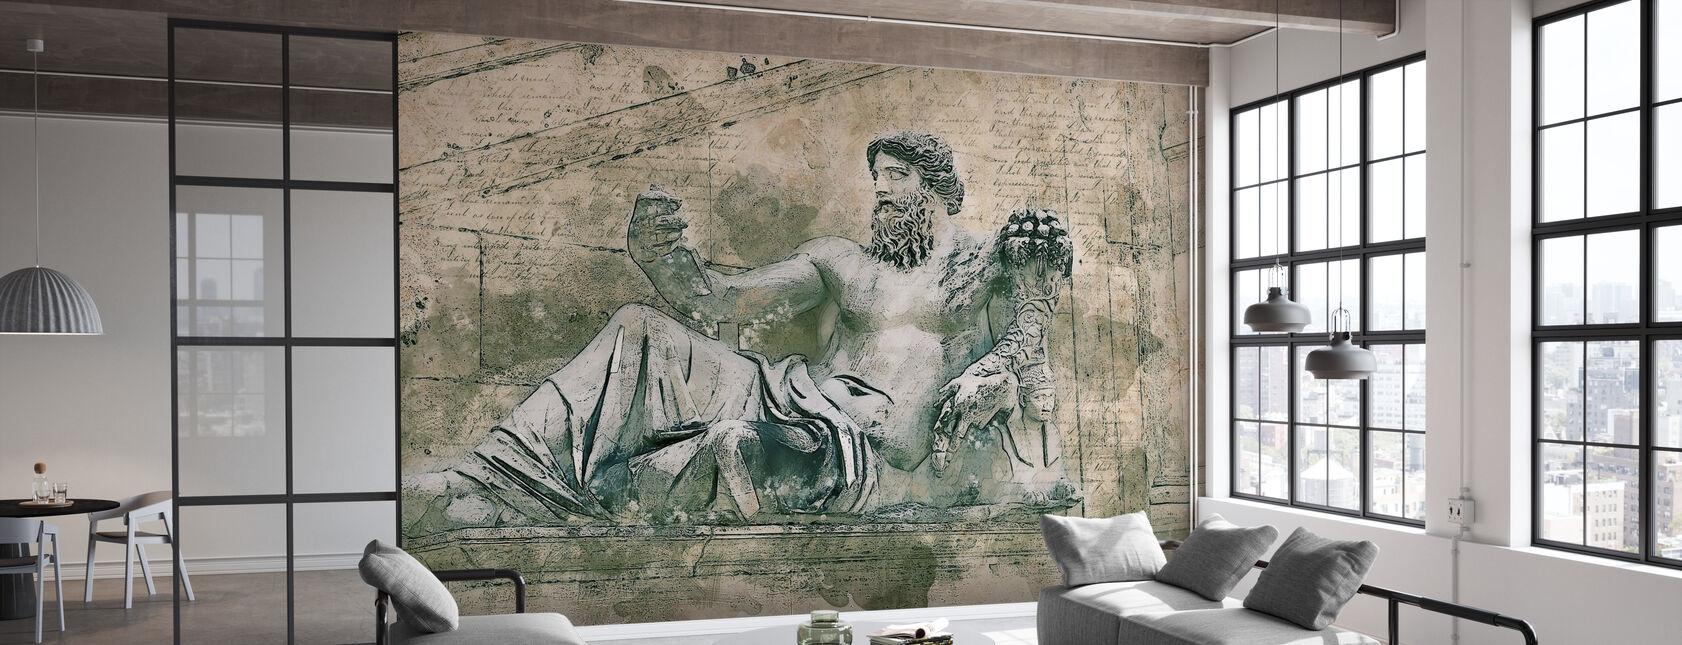 Rom Vintage Staty - Tapet - Kontor